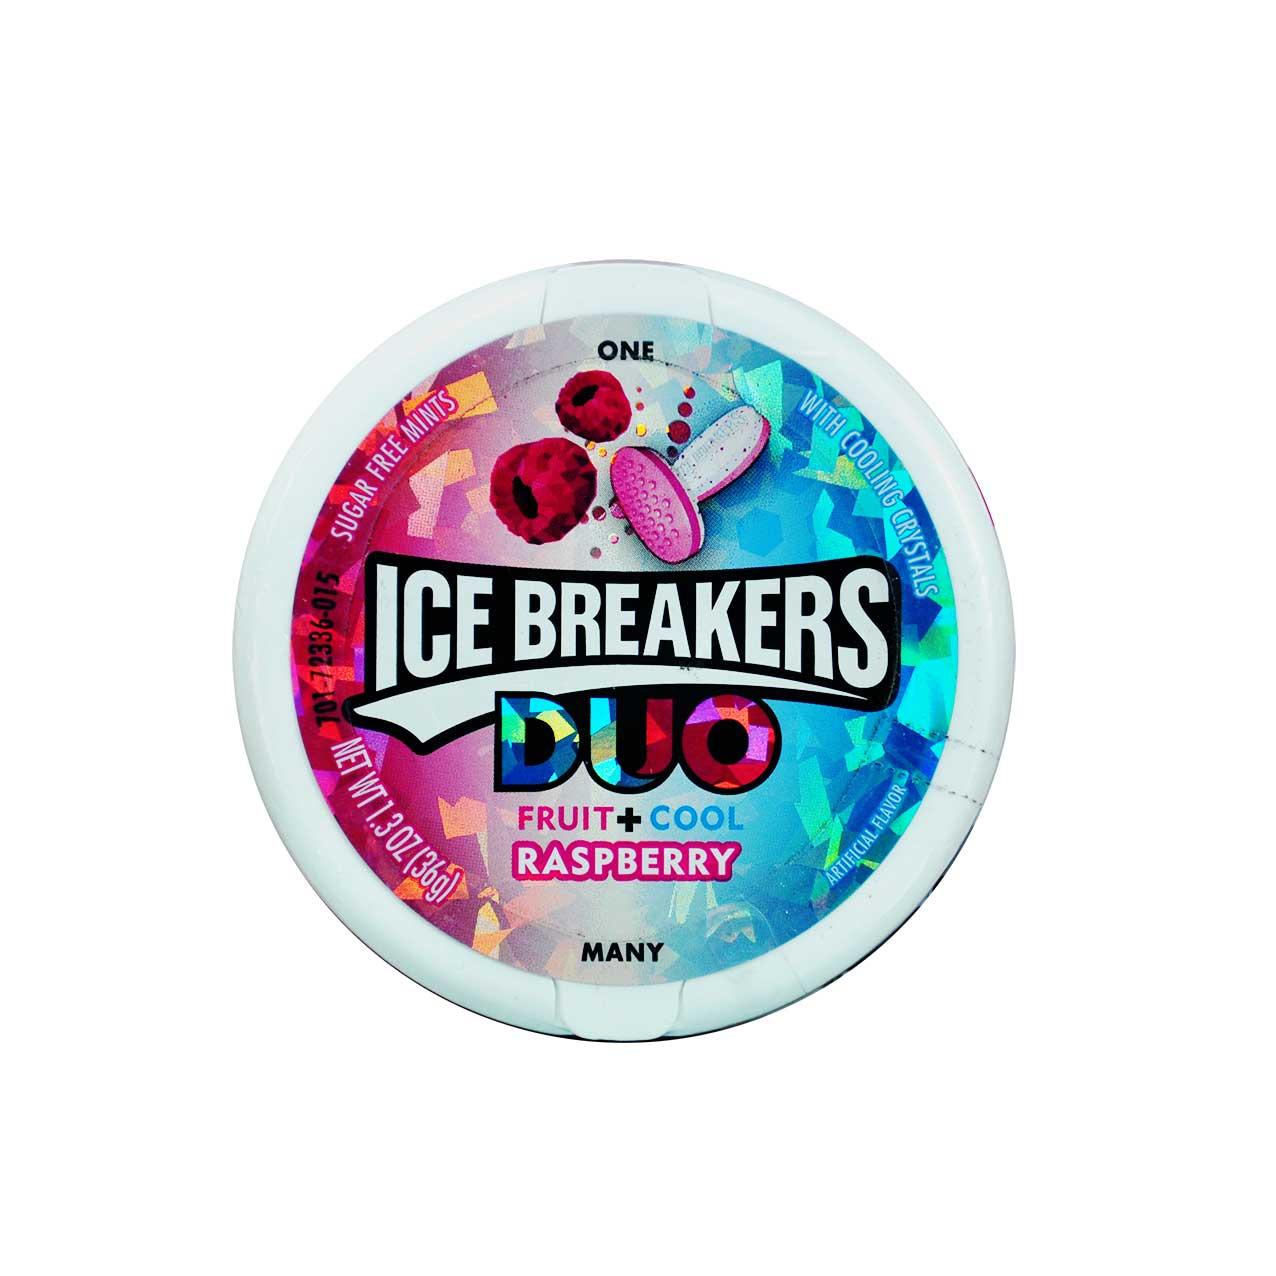 آبنبات تمشک آیس بریکرز – ice breakers